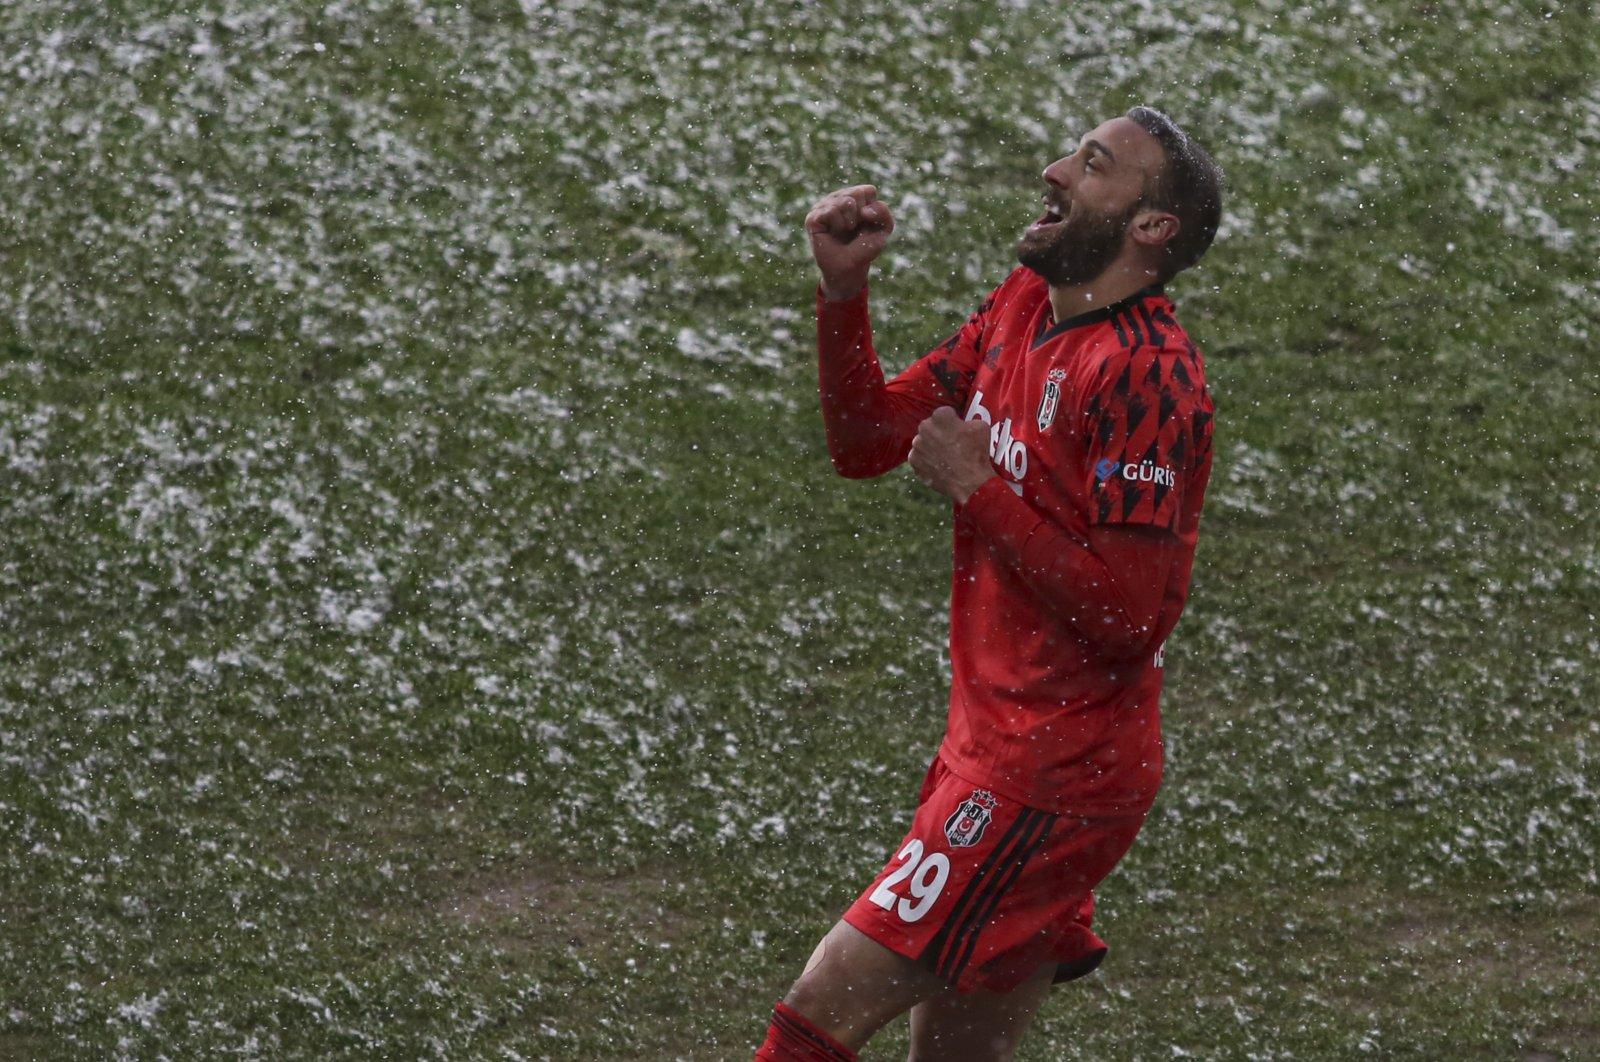 Beşiktaş forward Cenk Tosun celebrates scoring againstGençlerbirliği at Ankara's Eryaman Stadium, Ankara, Turkey, Feb. 15, 2021.